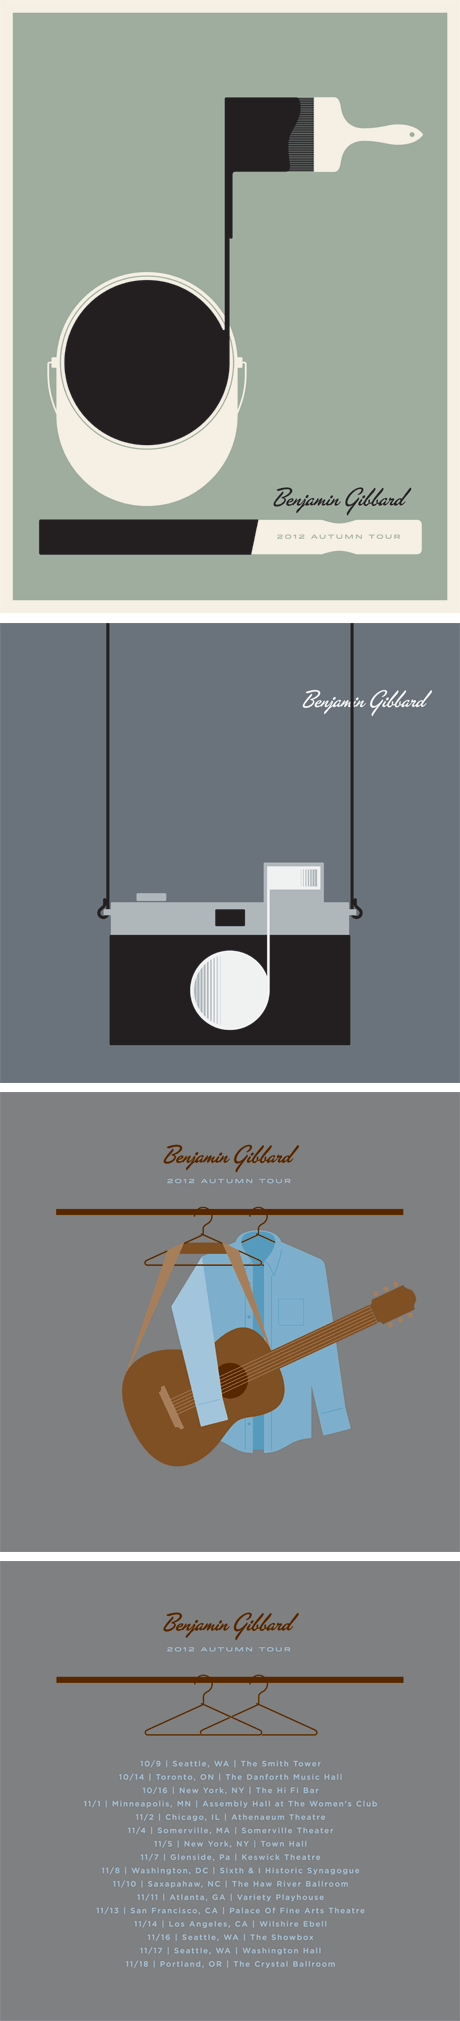 A beautiful set of Benjamin Gibbard posters designed by Jason Munn @munnjason #TheSmallStakes